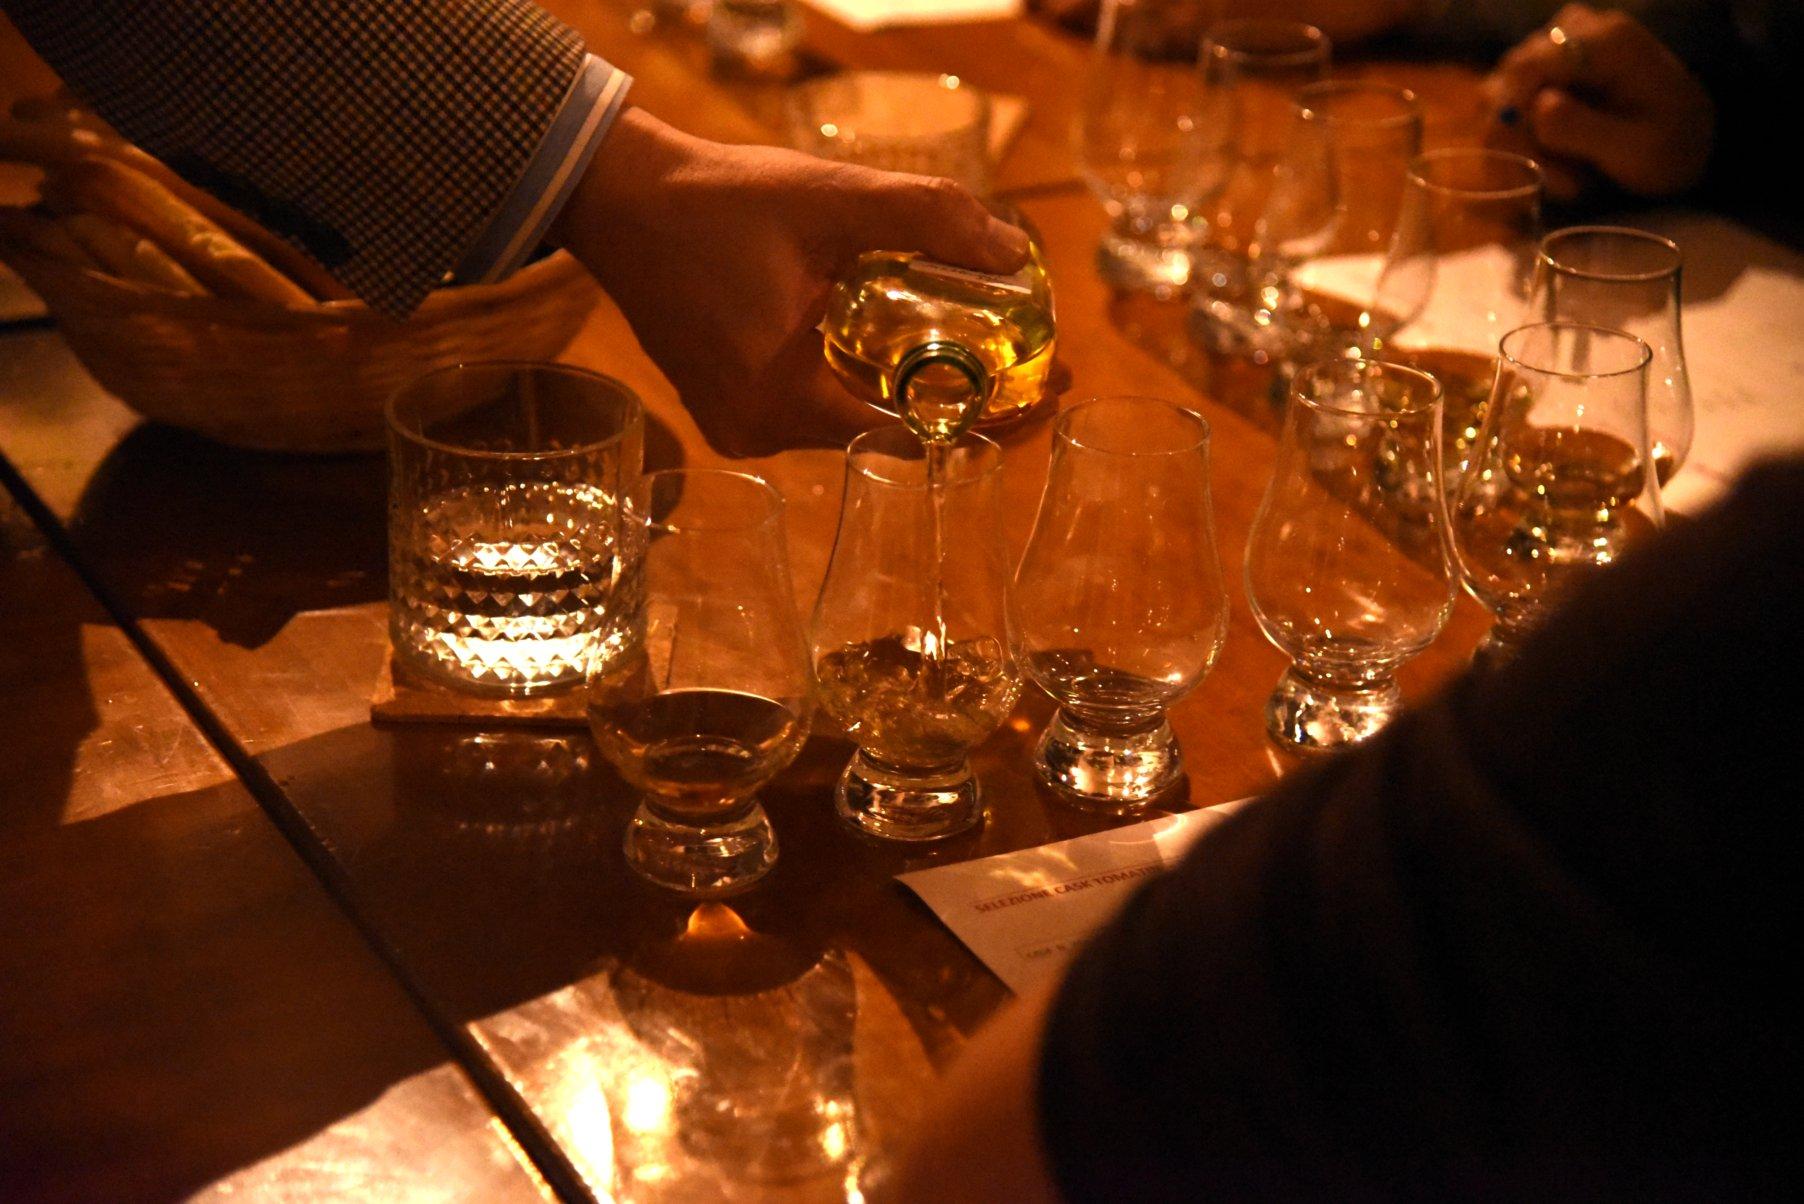 Maurizio mi versa un whisky